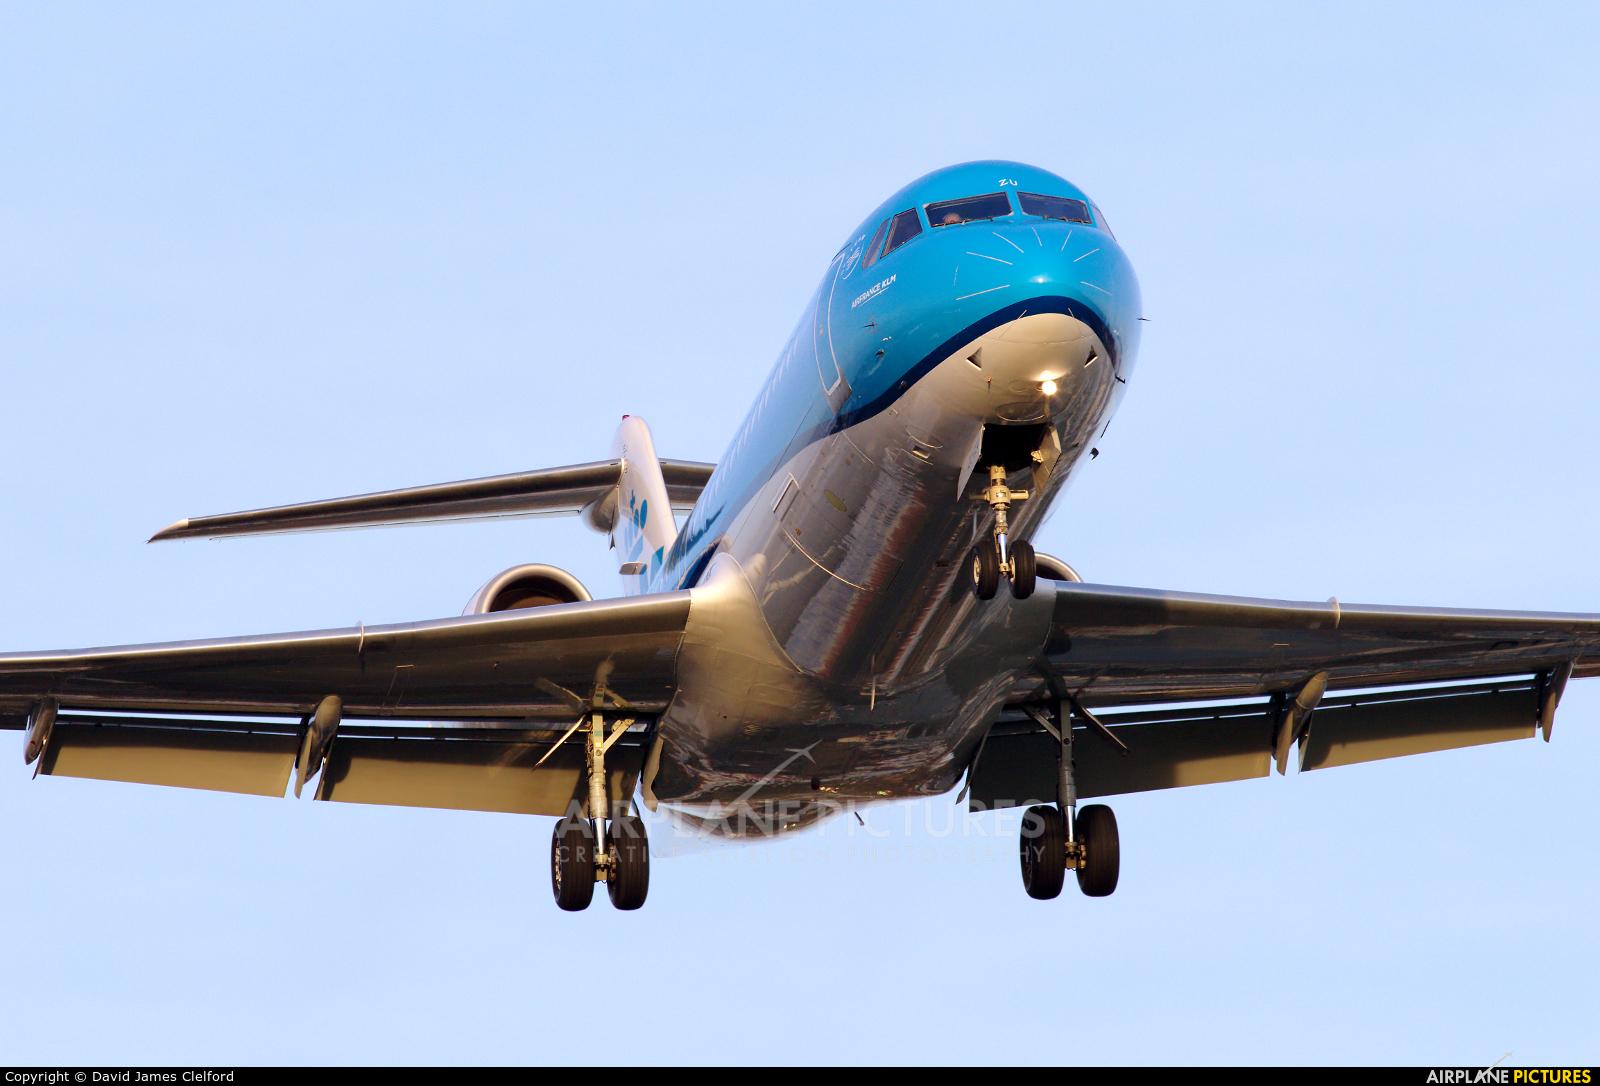 KLM Cityhopper PH-KZU aircraft at London - Heathrow